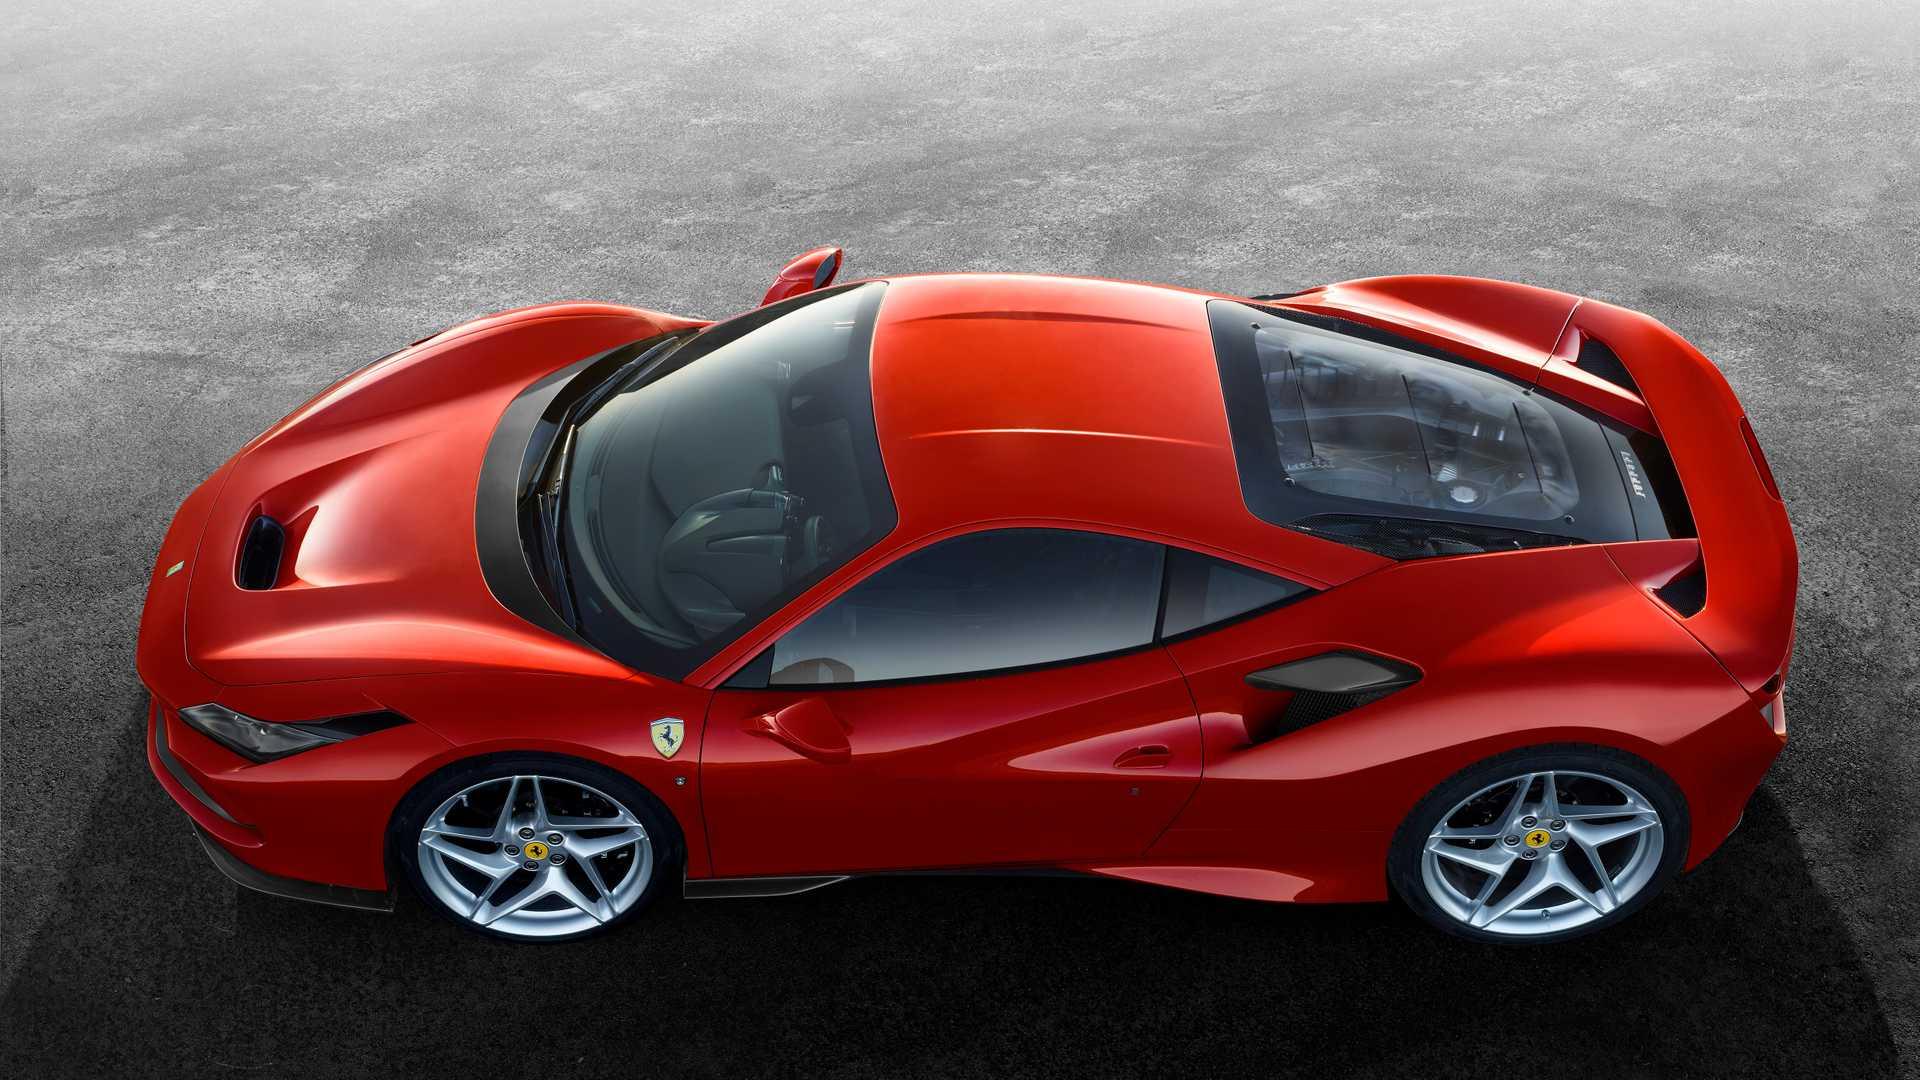 Ferrari представит несколько новинок до конца 2019 года 1